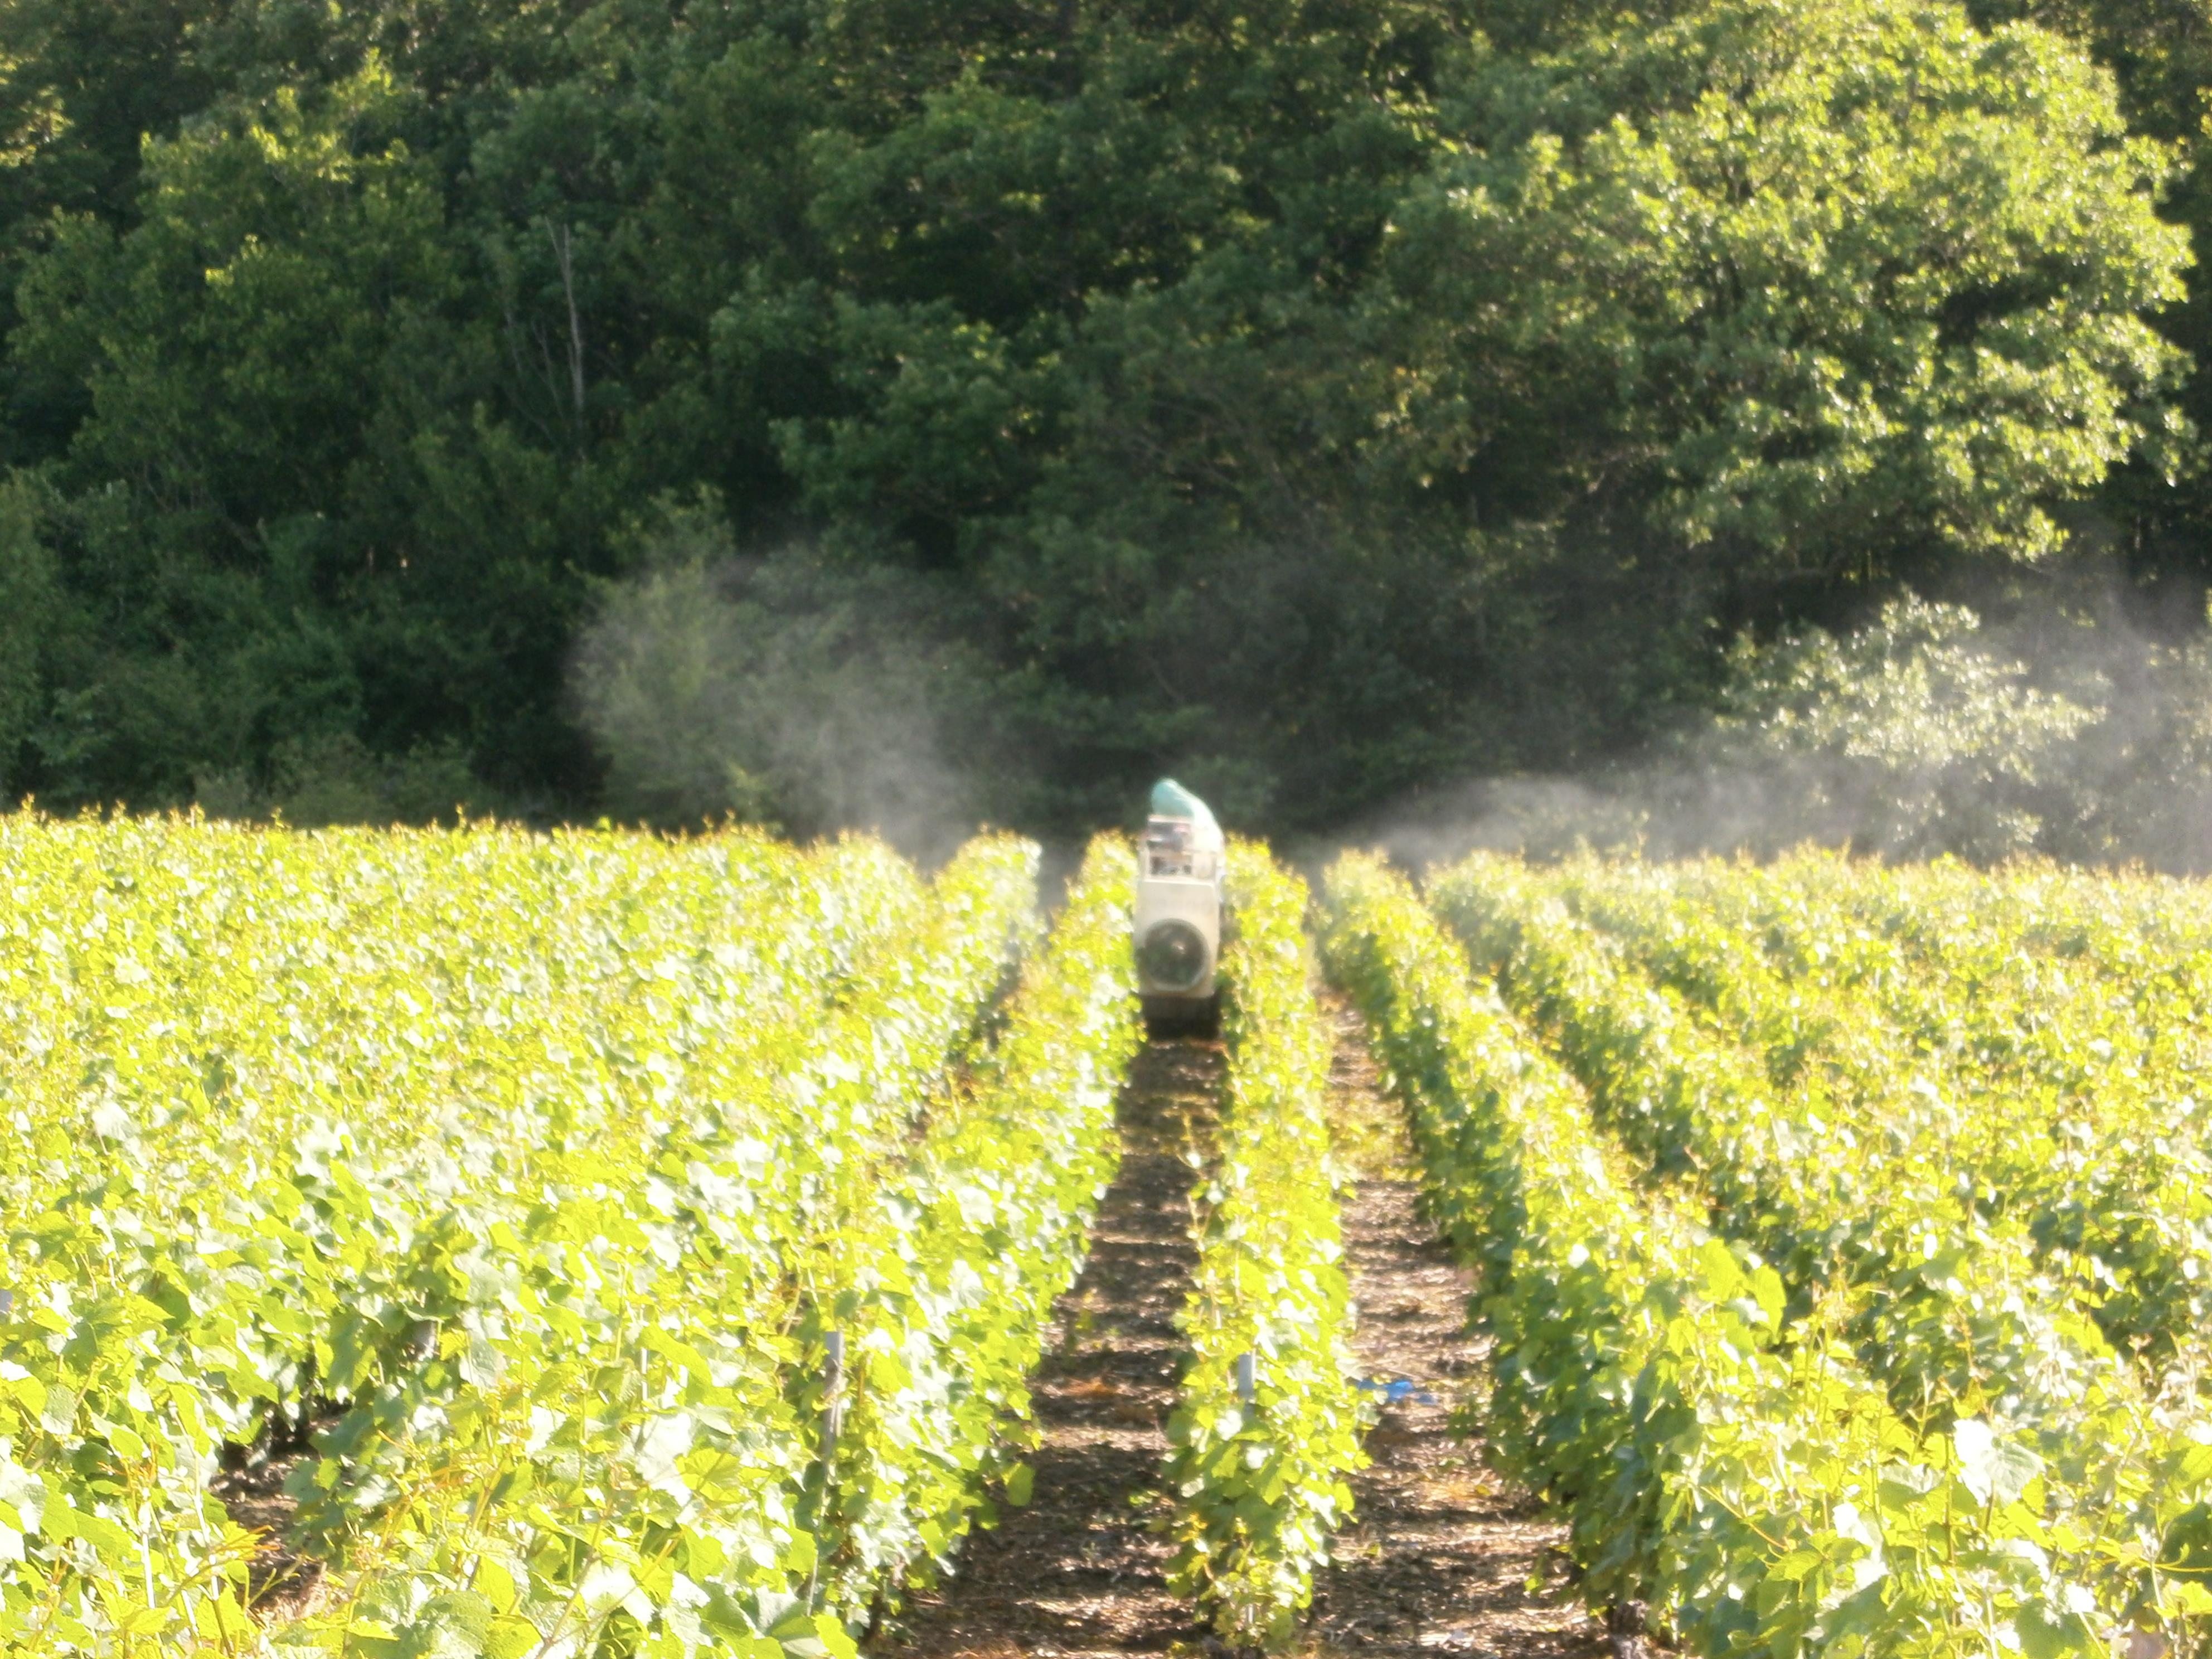 Traitement phytosanitaire avec chenillard